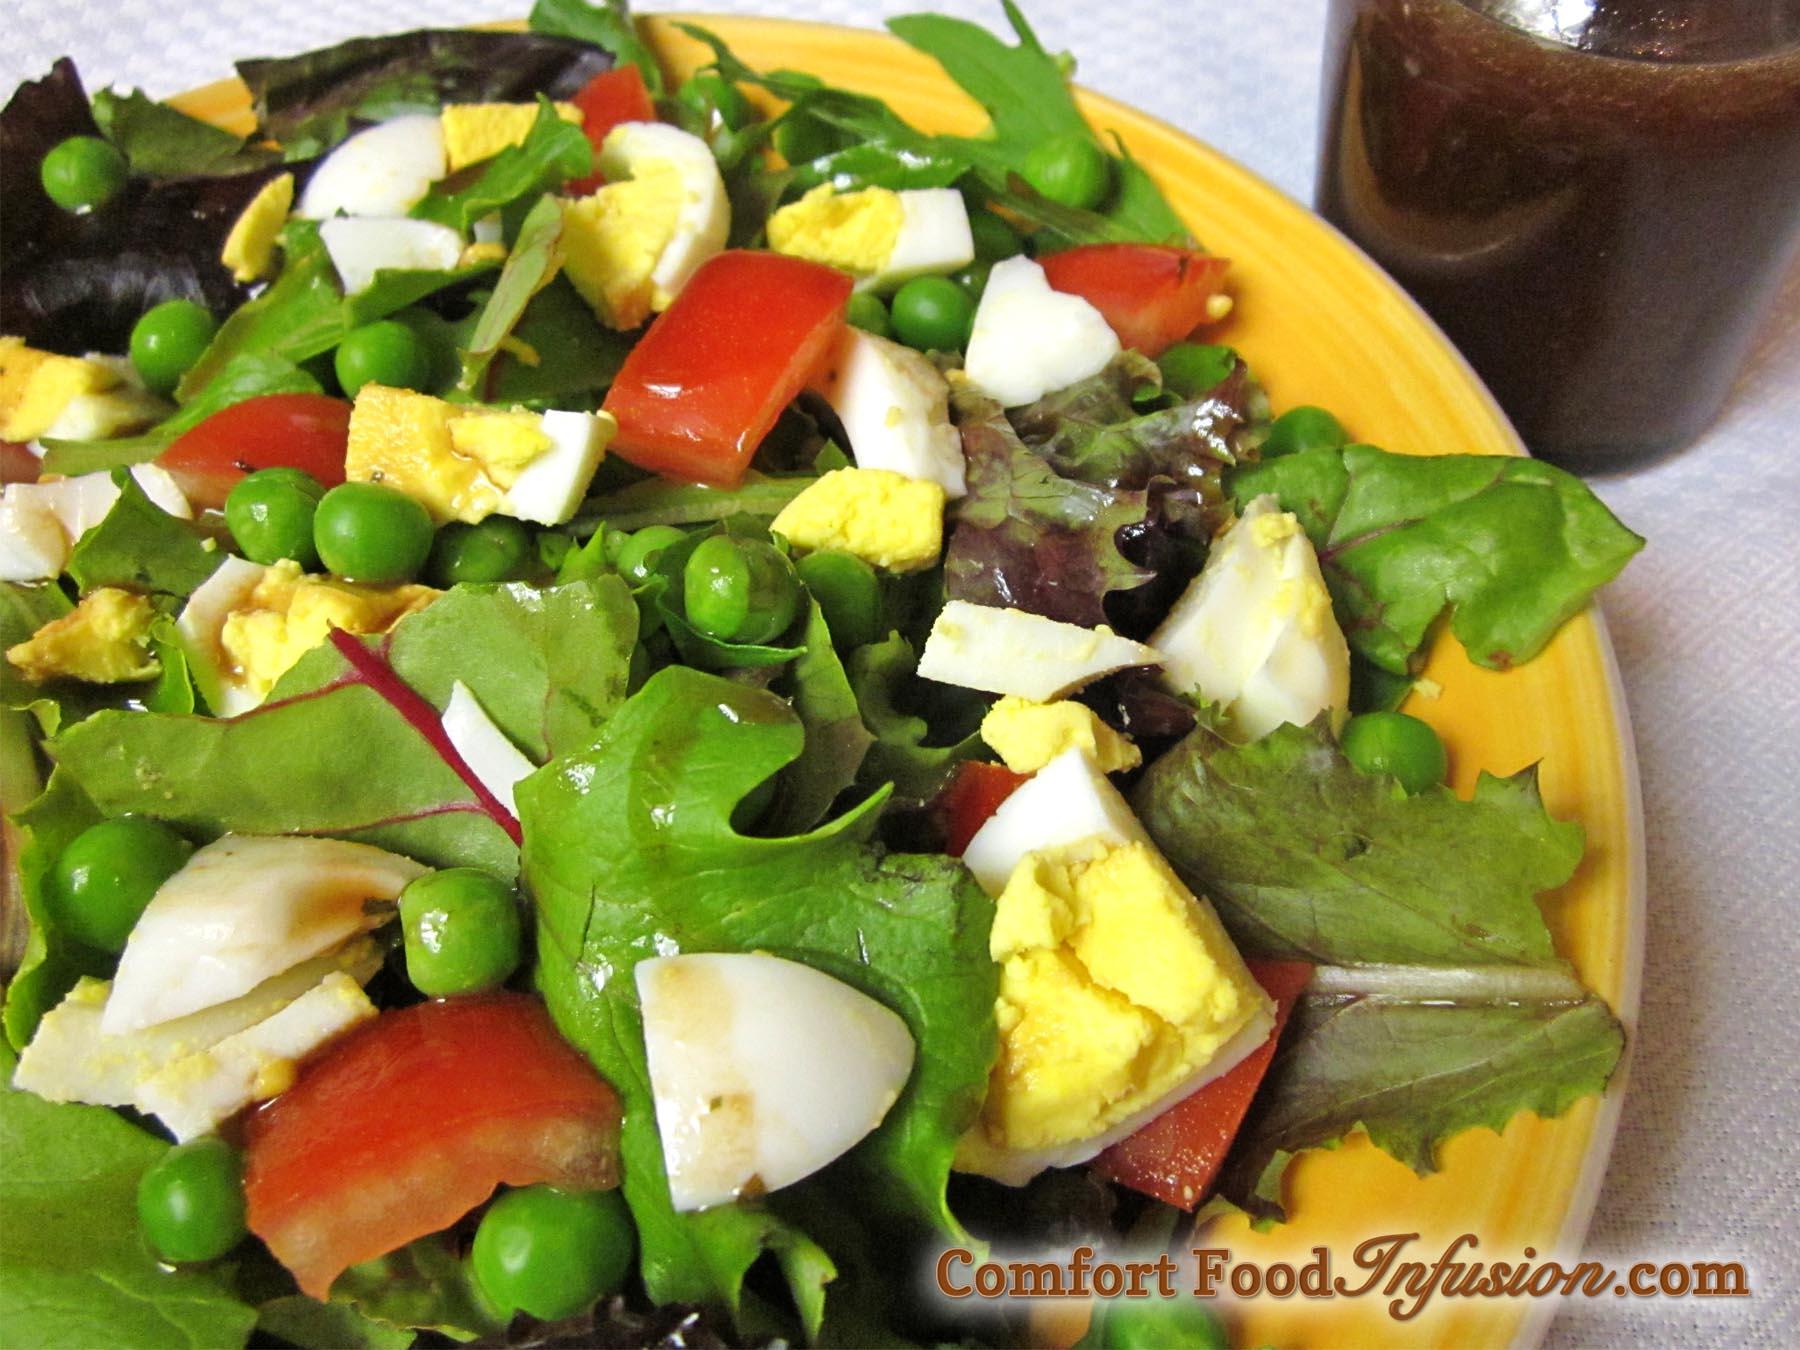 Read More Mixed Greens And Egg Salad With Tarragon Vinaigrette